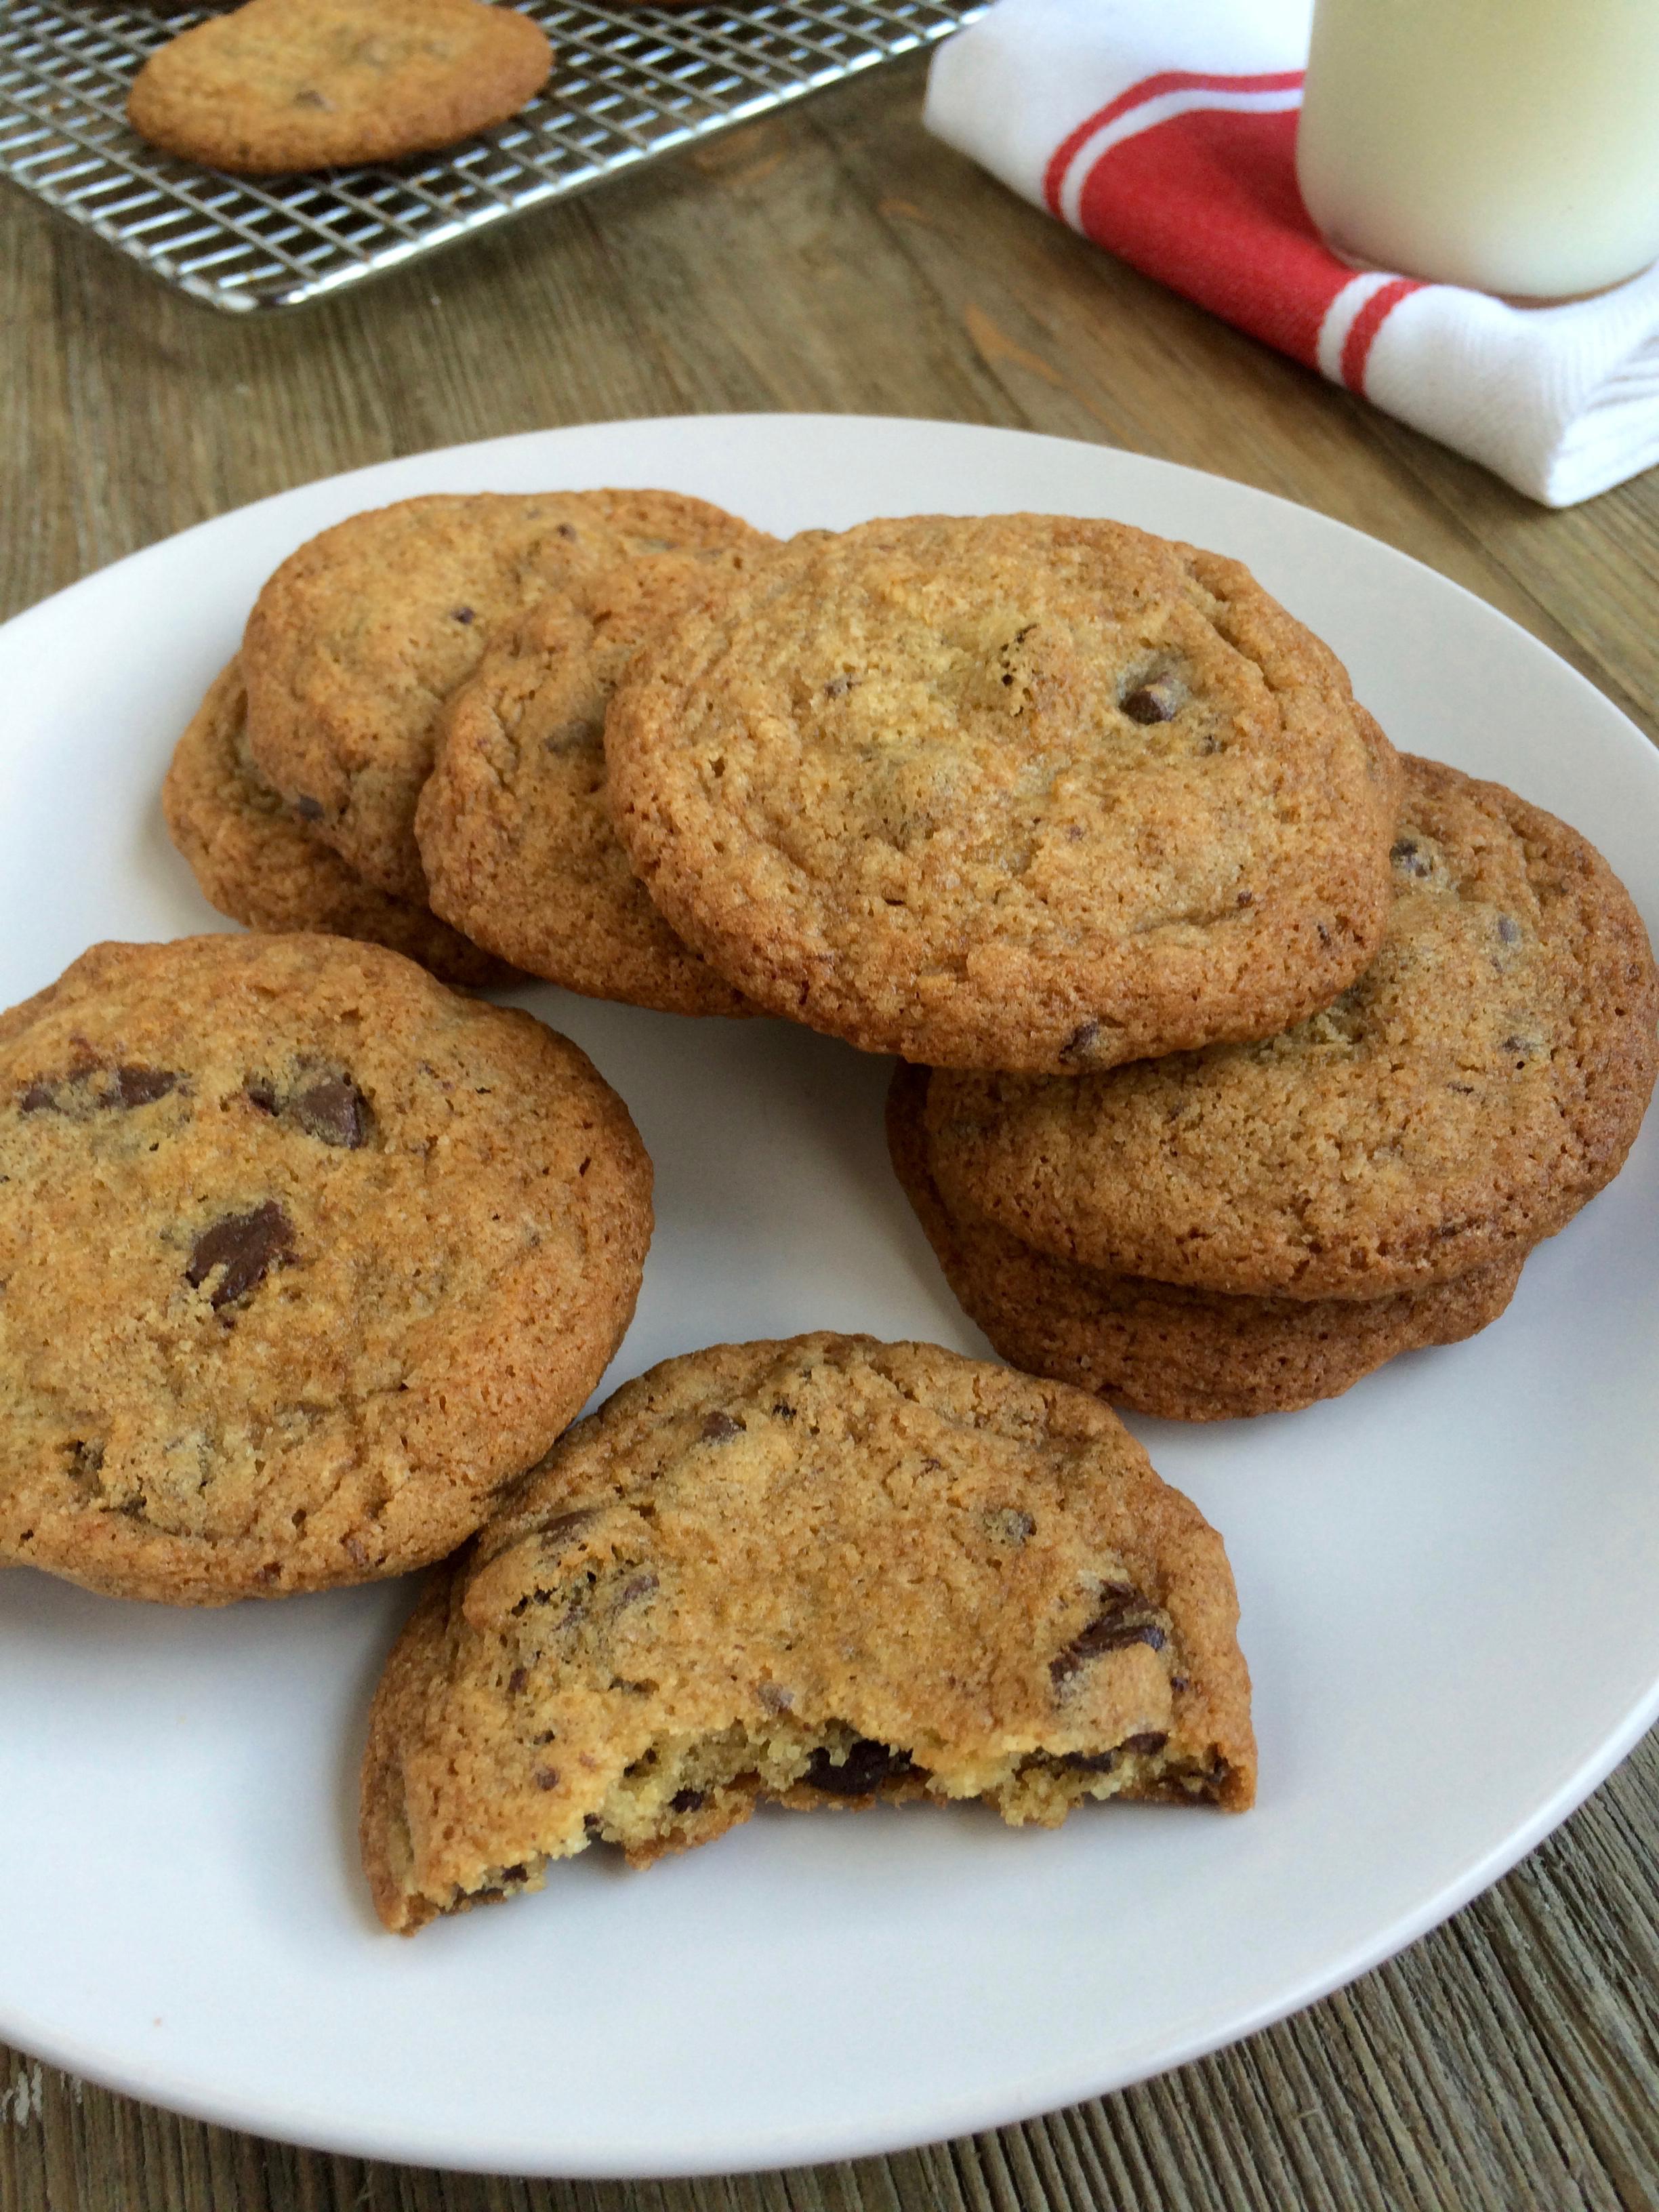 Chocolate Chip Cookies jut like Tate's!